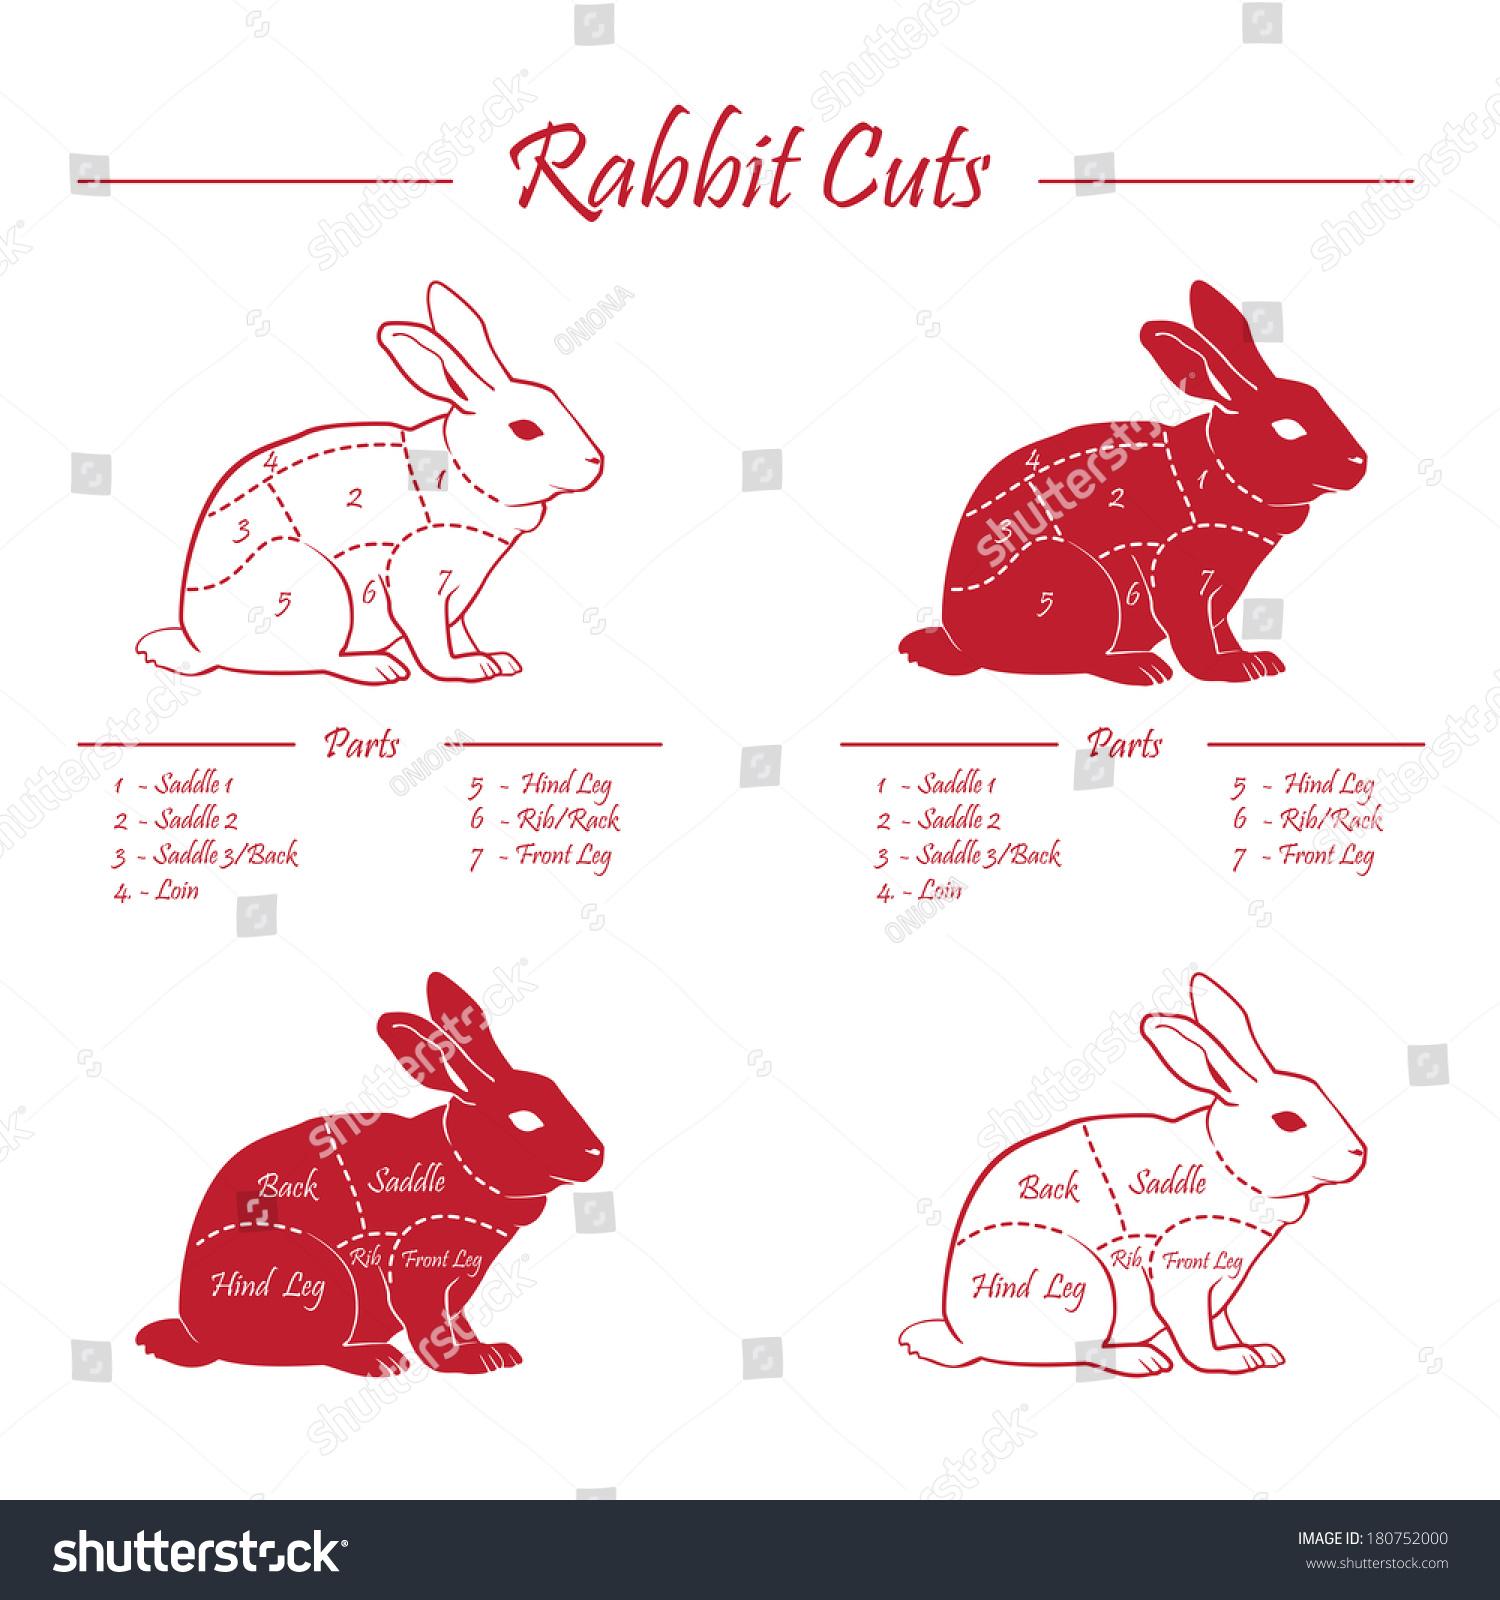 rabbit heart diagram circuit maker pics photos pork meat cuts sexy girl and car